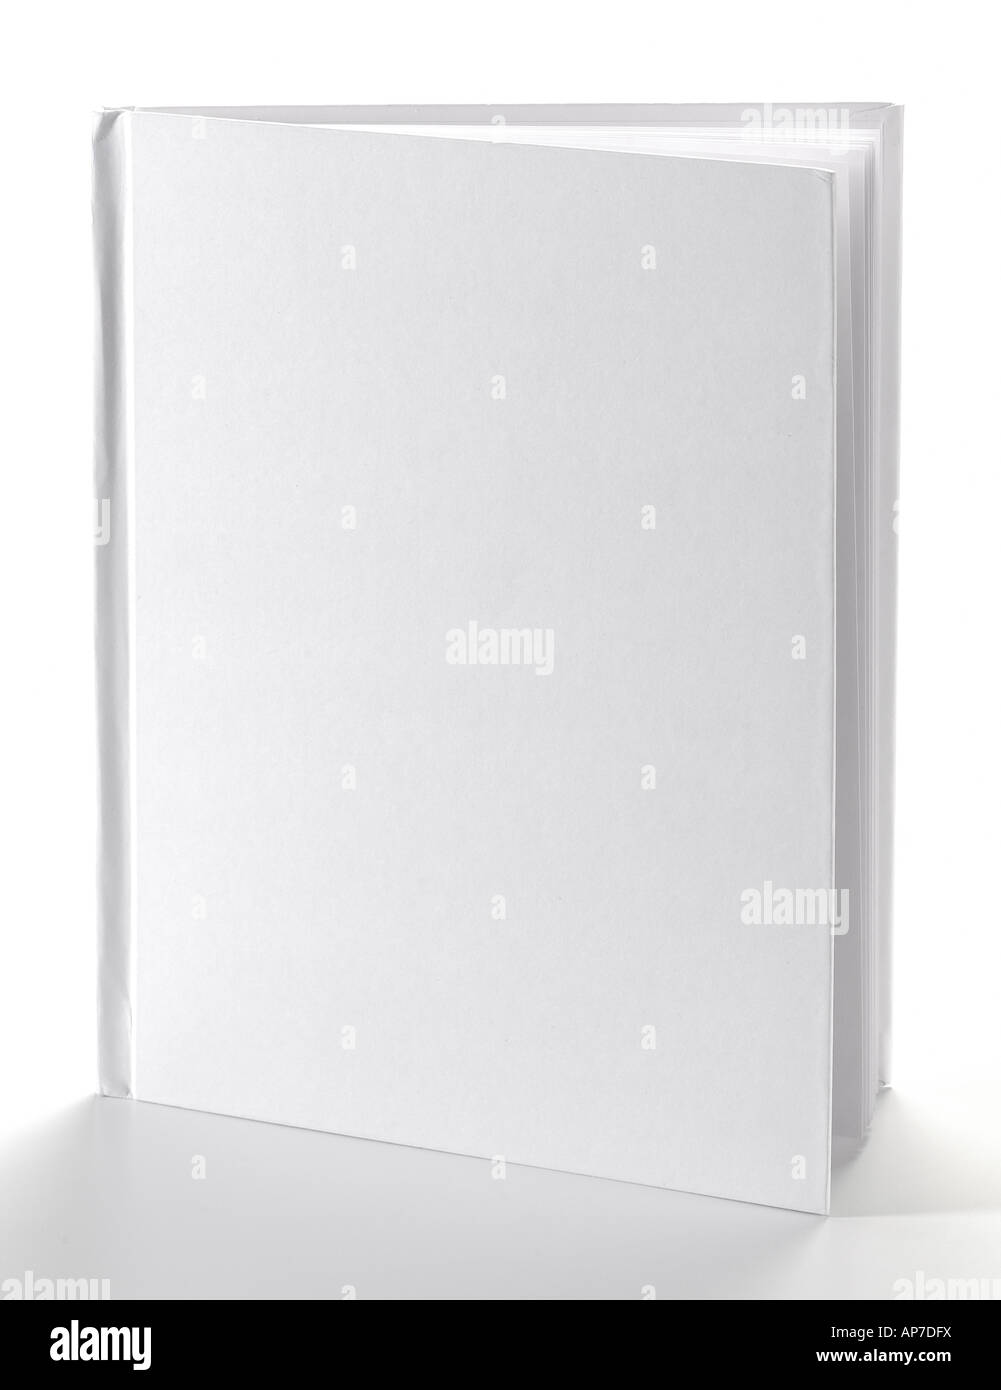 Plain Blank White Book Studio Still Life - Stock Image